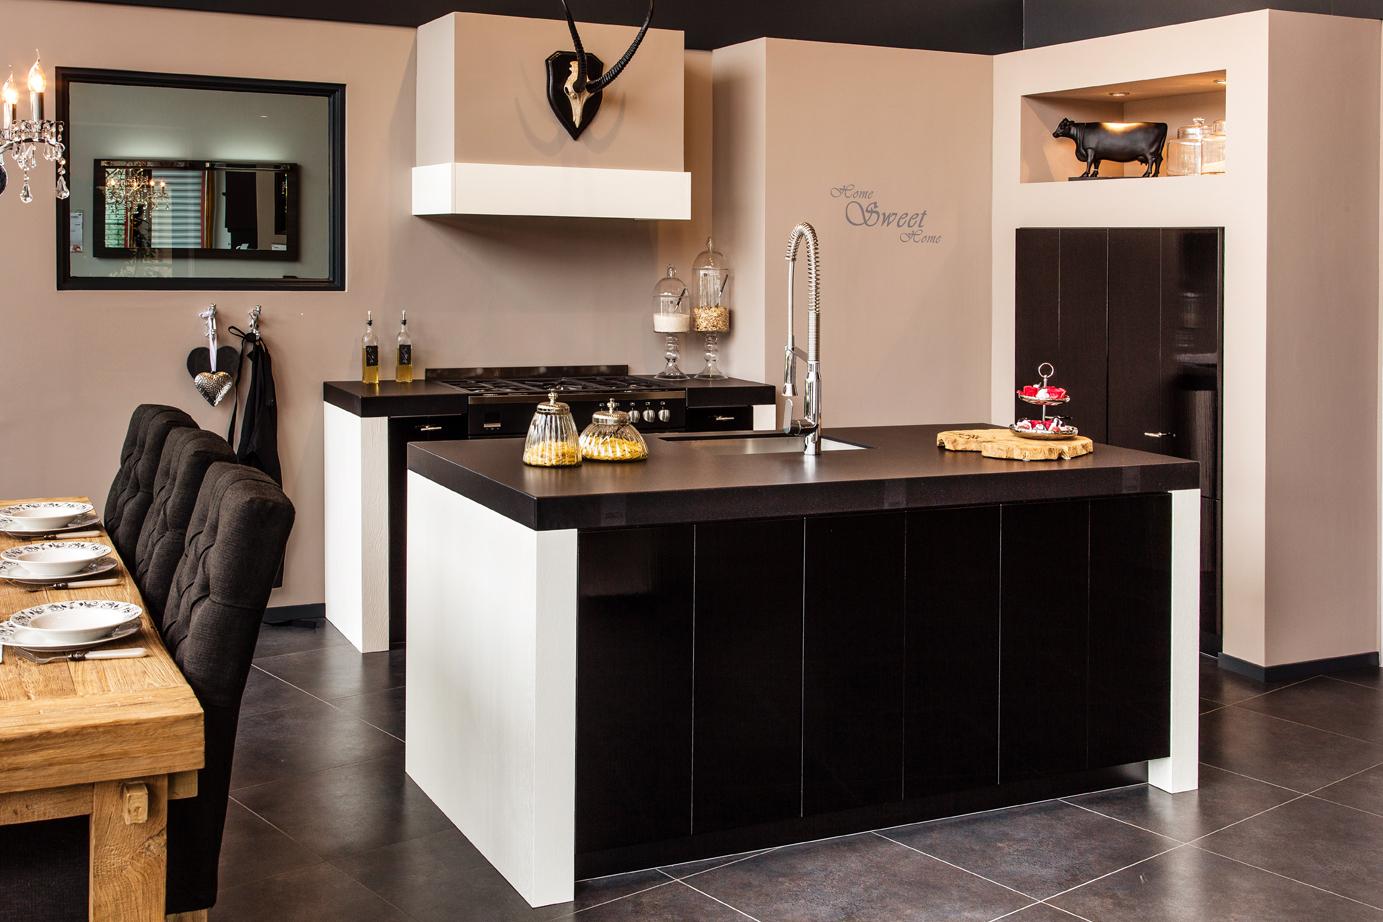 Showroomkeukens Outlet : 60+ moderne keukens Foto's en prijzen DB Keukens